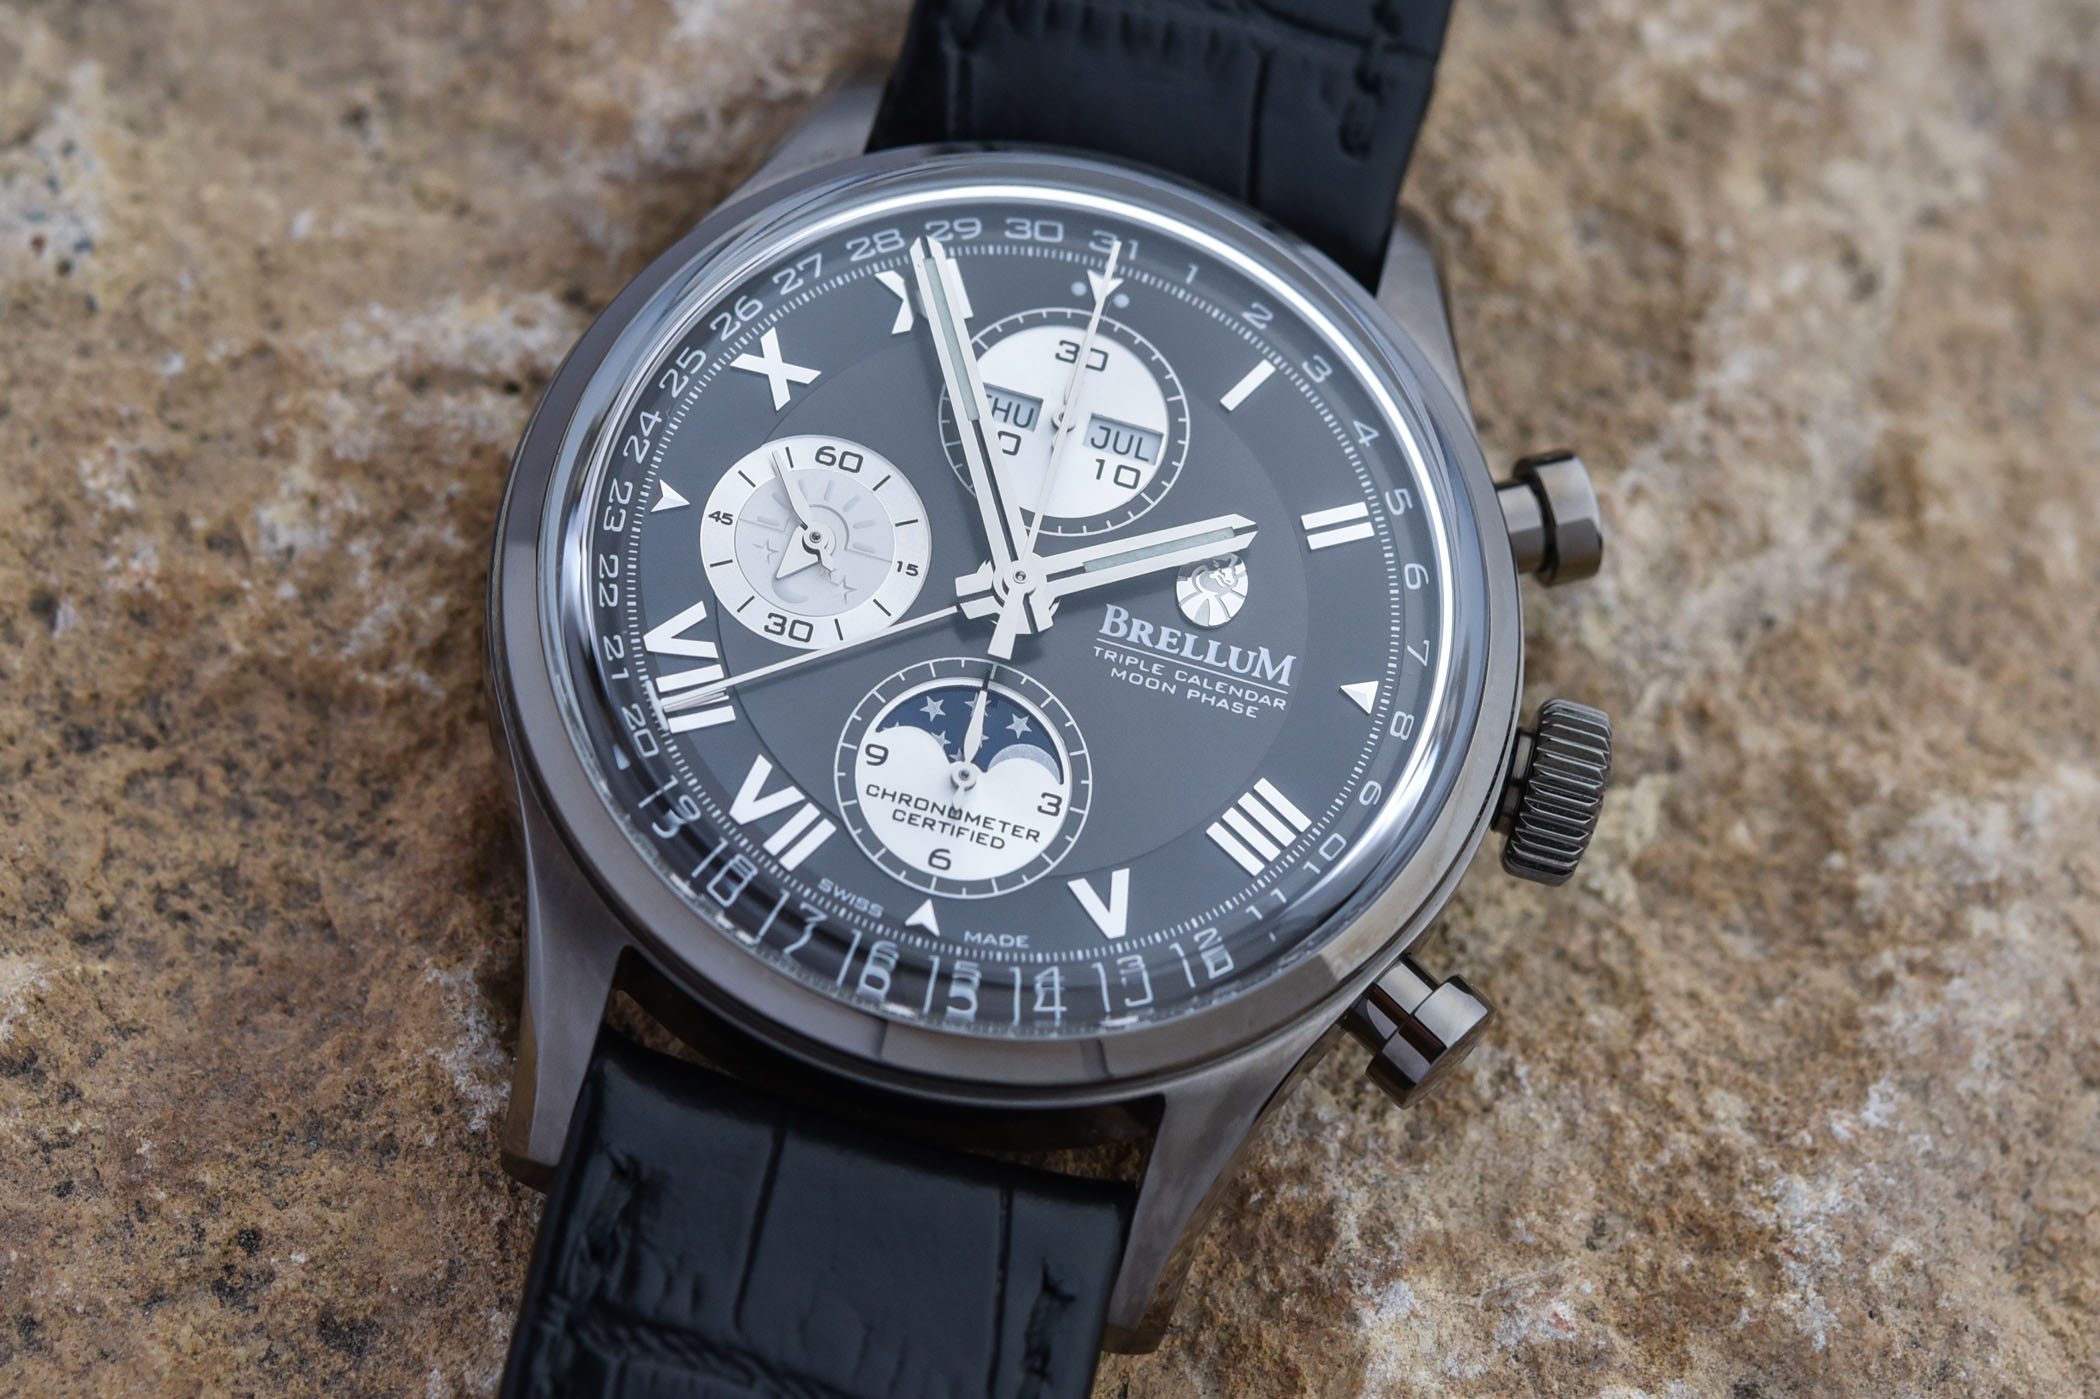 Brellum Duobox Classic LE.8 Chronometer Full Calendar Chronograph COSC